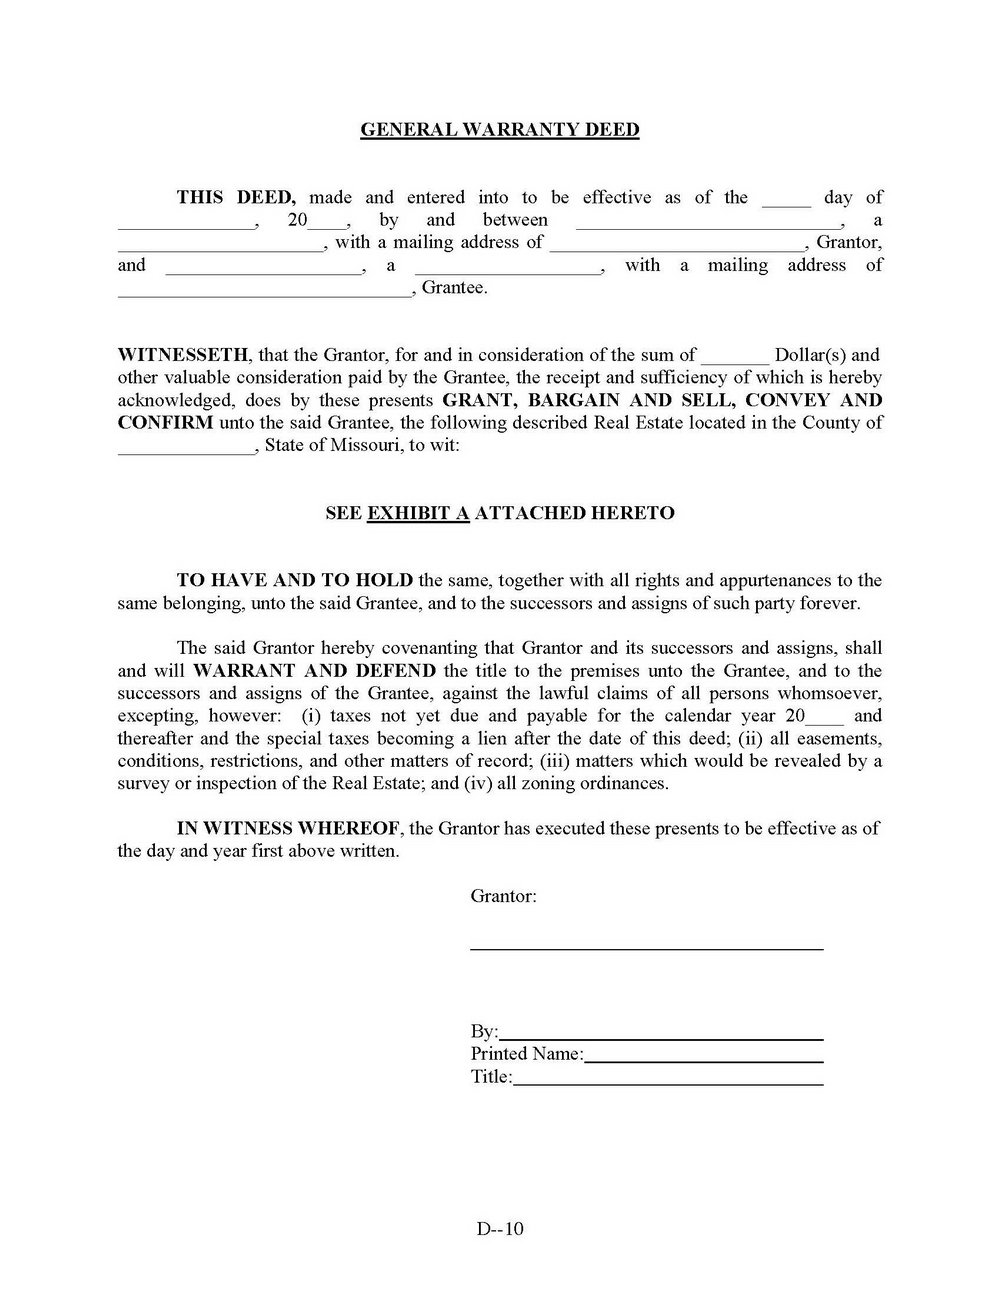 Pennsylvania Quit Claim Deed Form Free